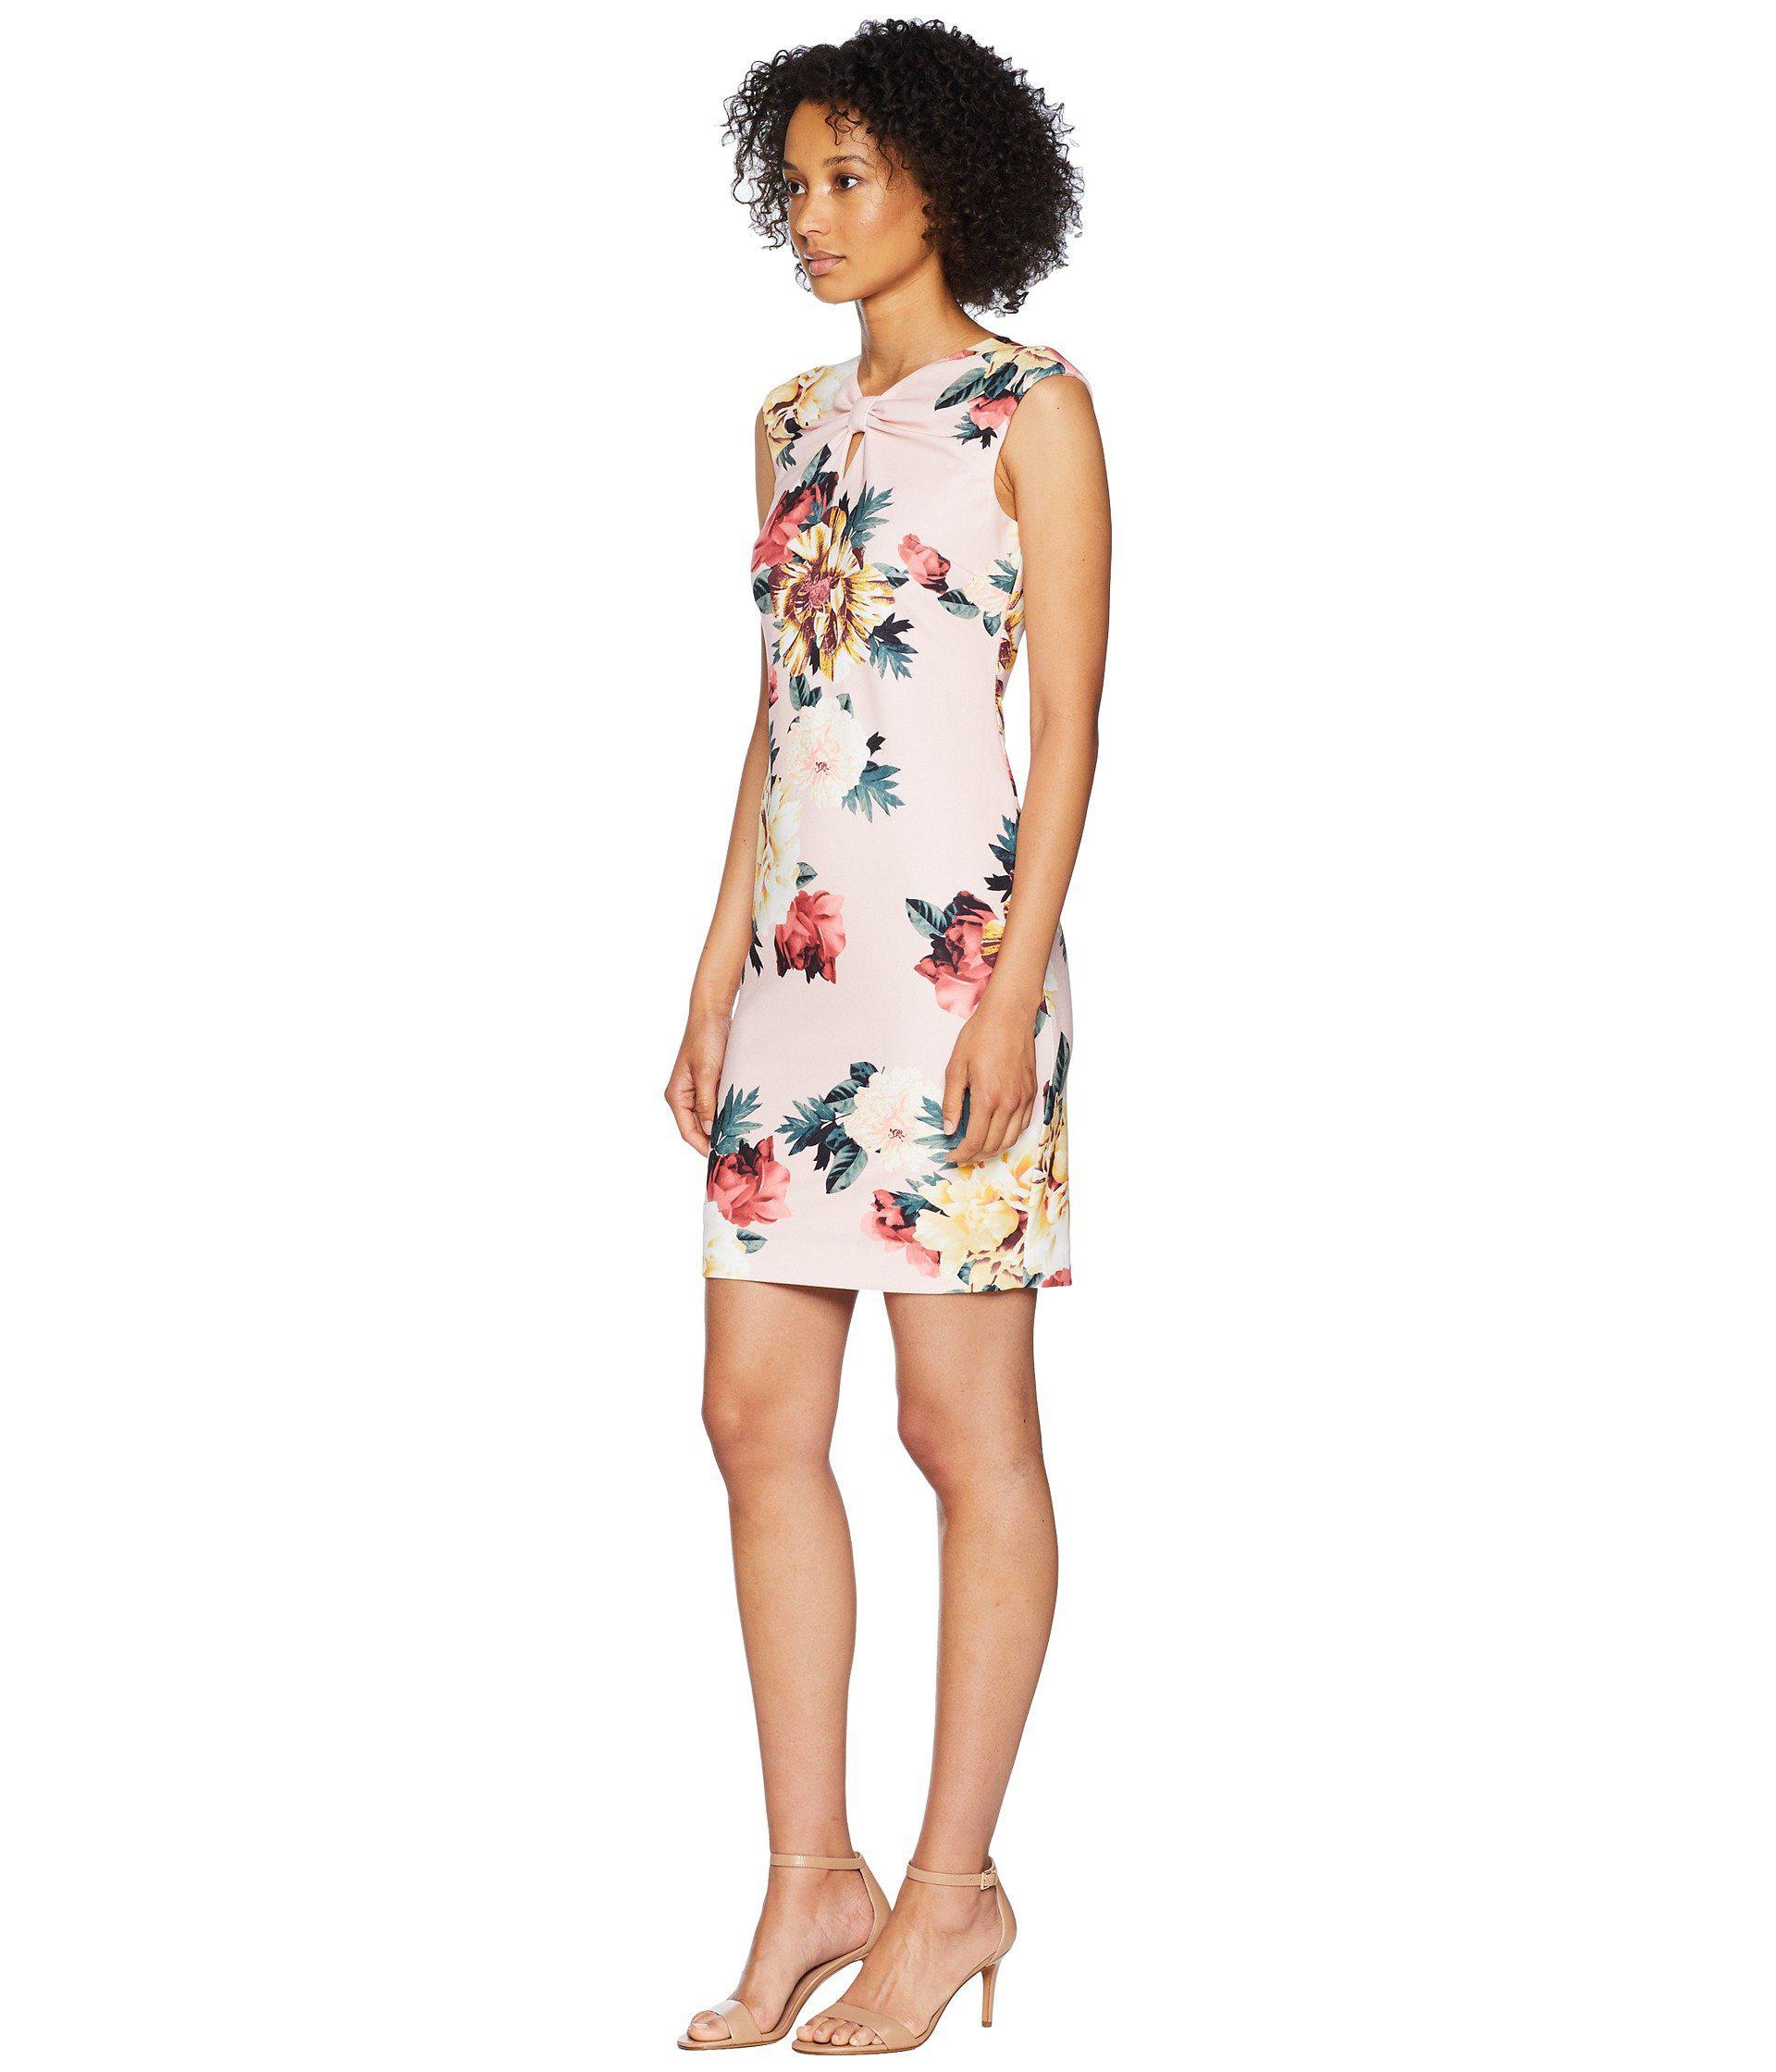 9ff766c256958 Tahari Petite Dresses Nordstrom - PostParc